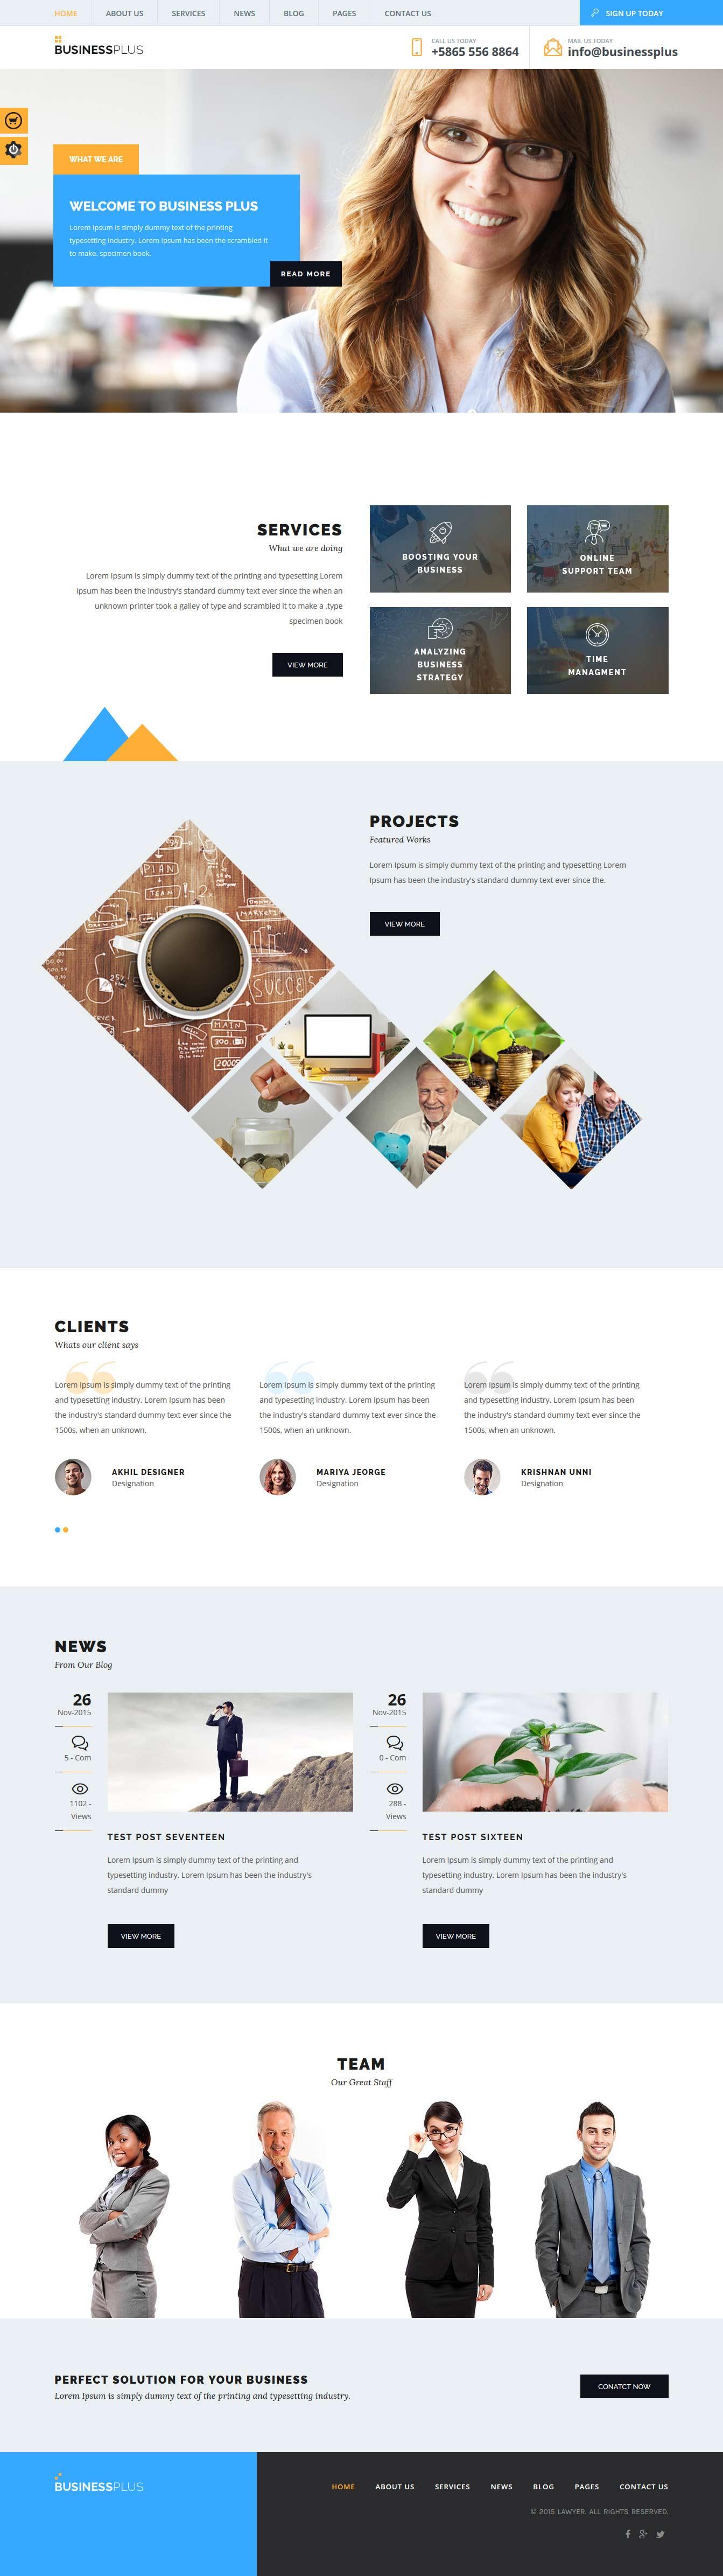 Business Plus: el mejor tema premium multipropósito de WordPress